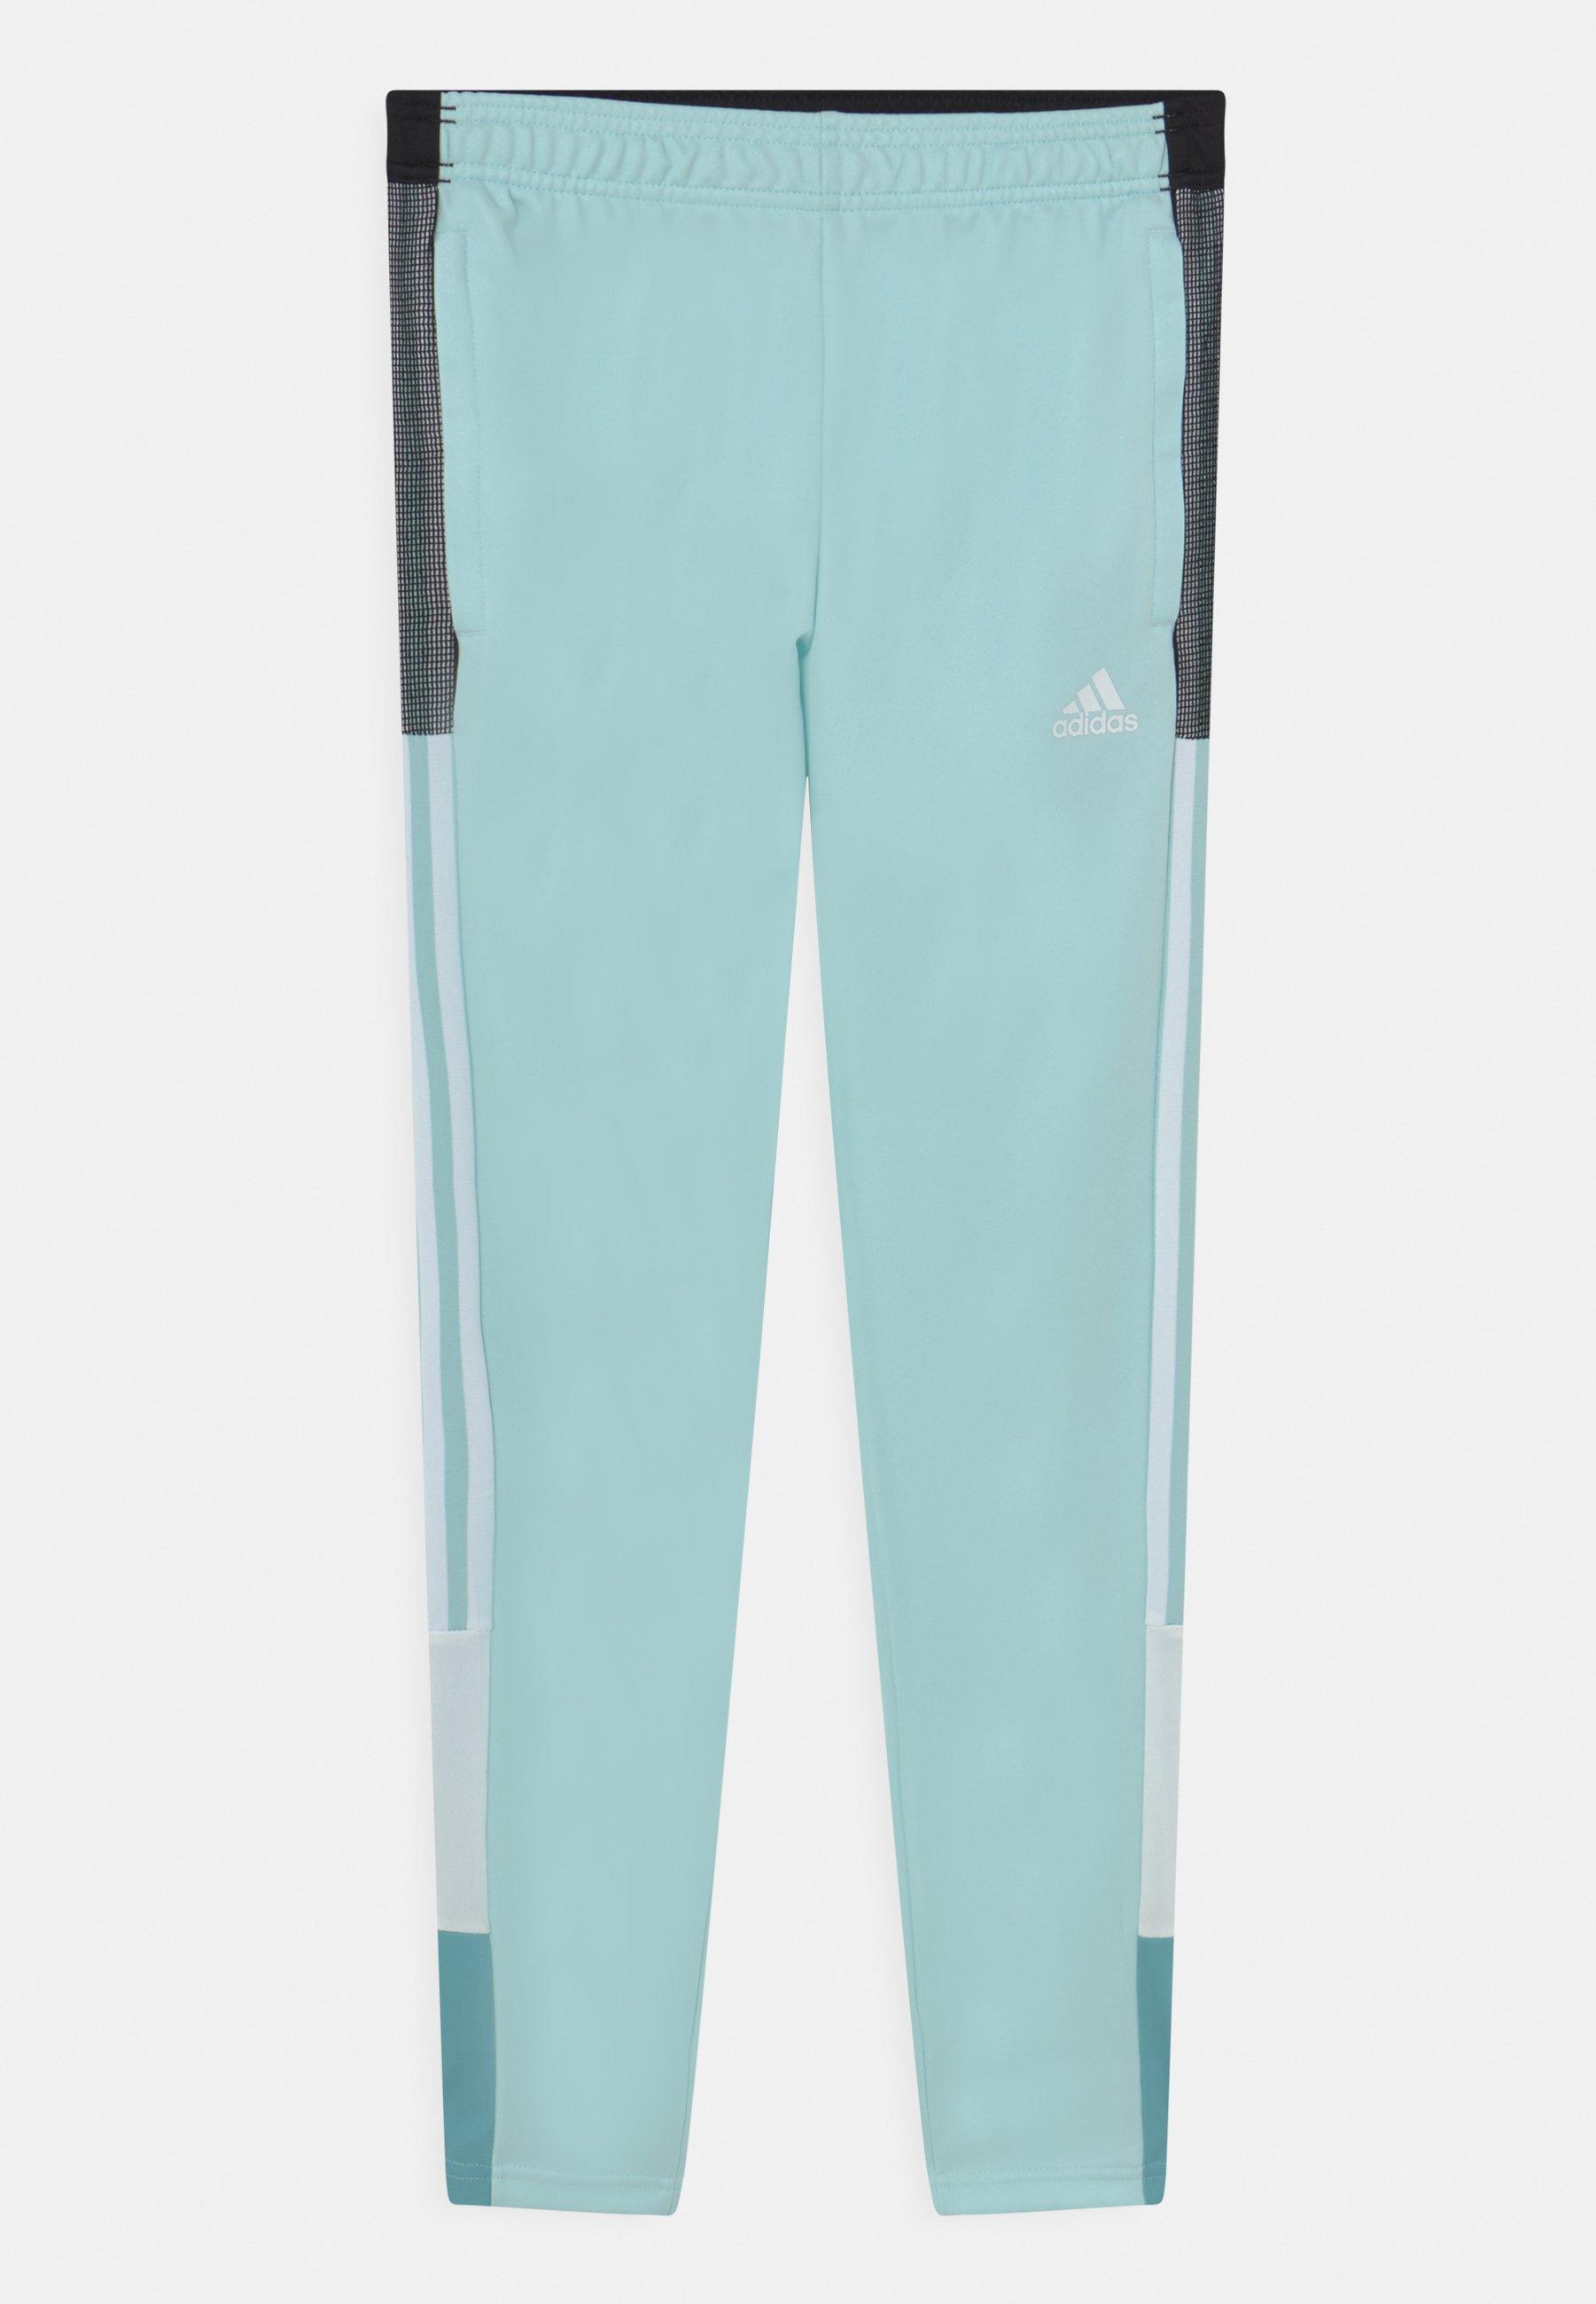 Bambini TIRO UNISEX - Pantaloni sportivi